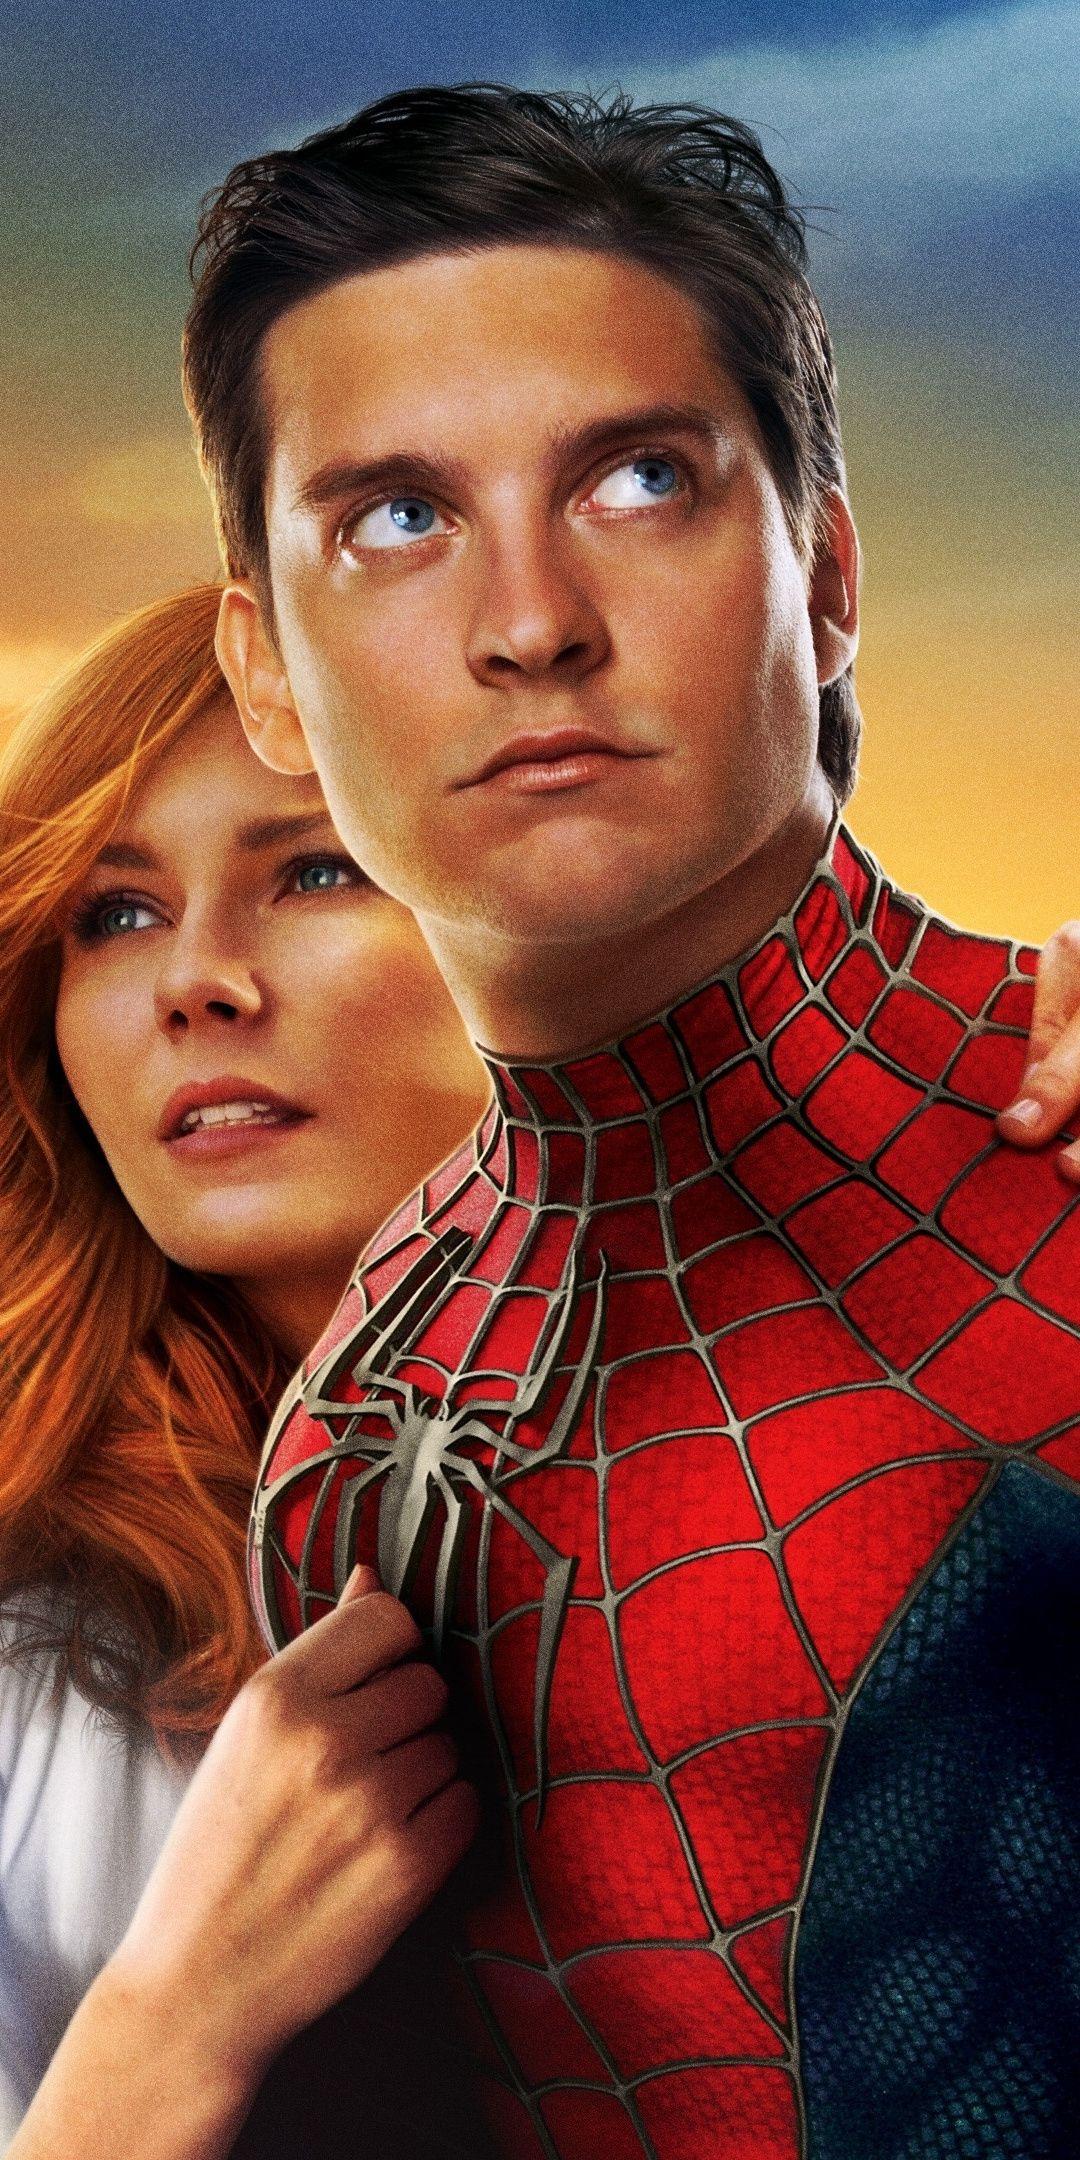 Spiderman, 2002 movie, poster, 1080x2160 wallpaper